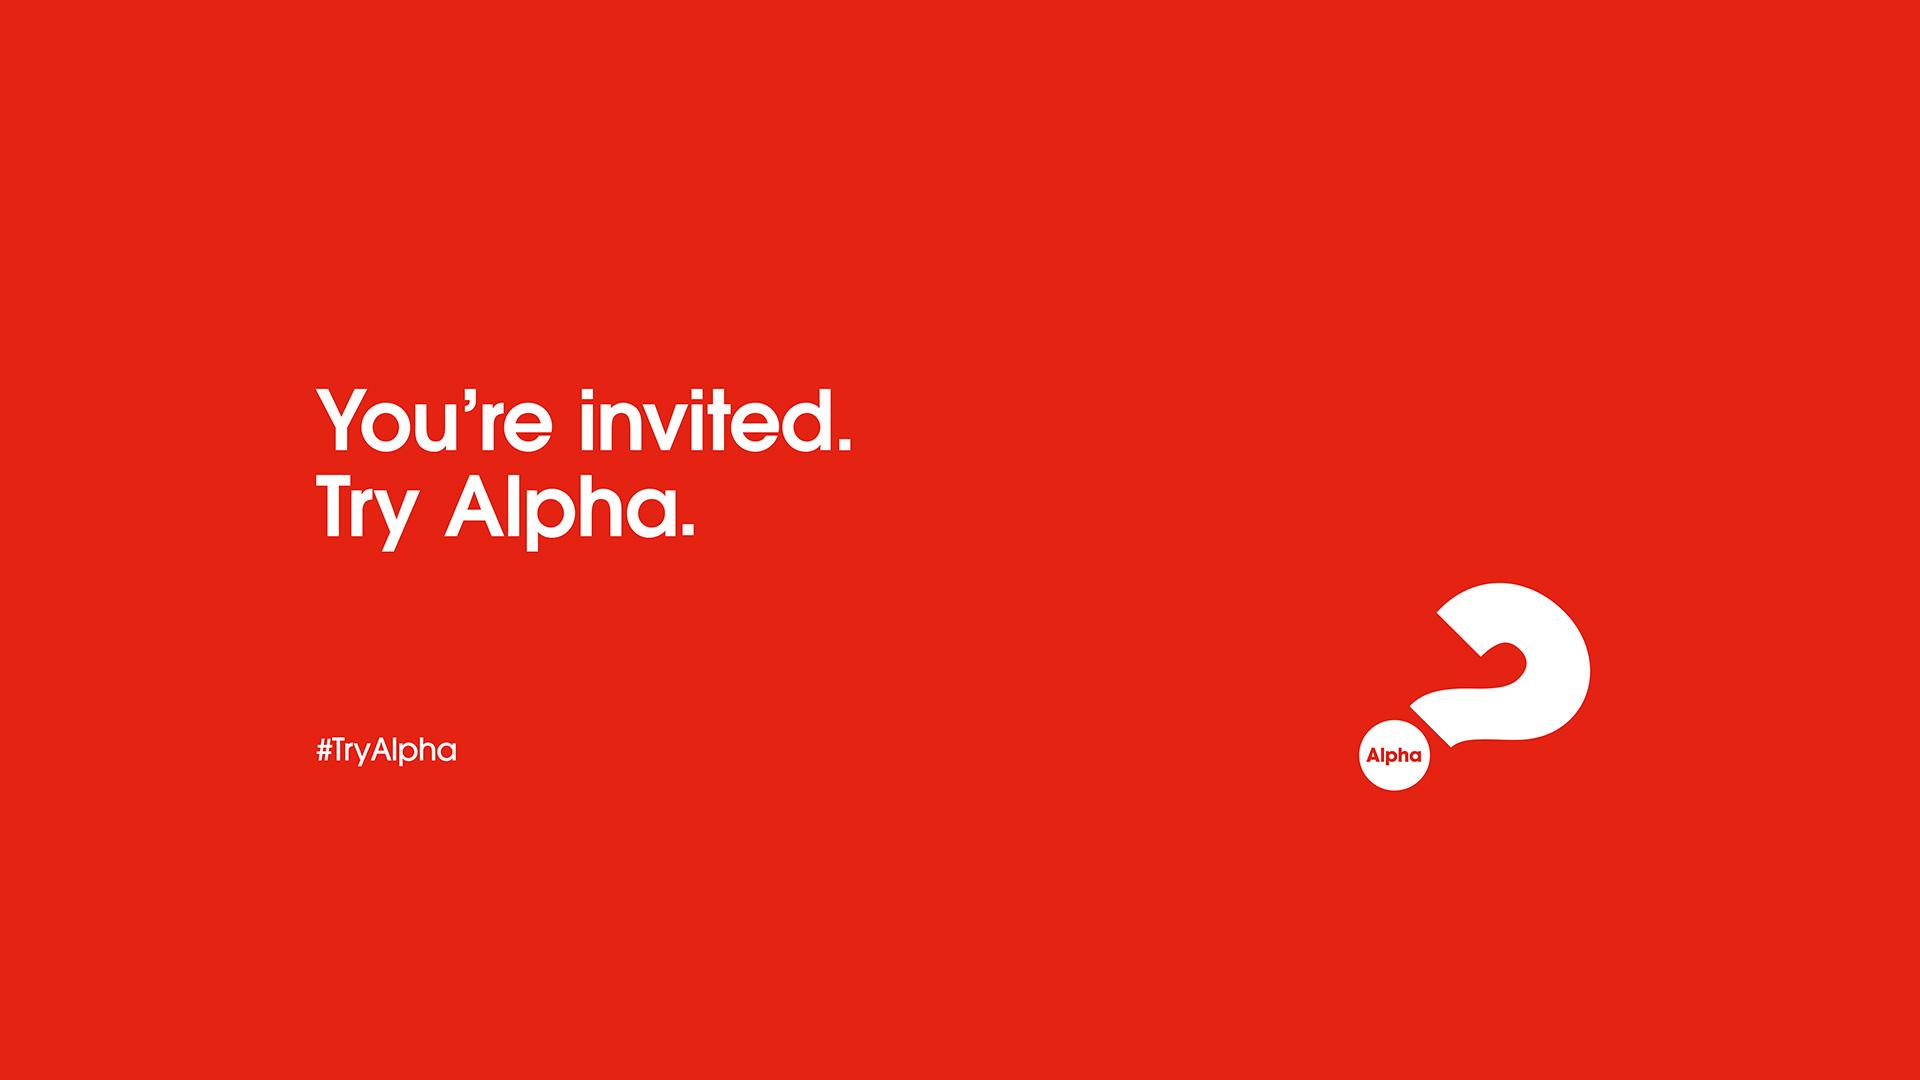 Image: Alpha